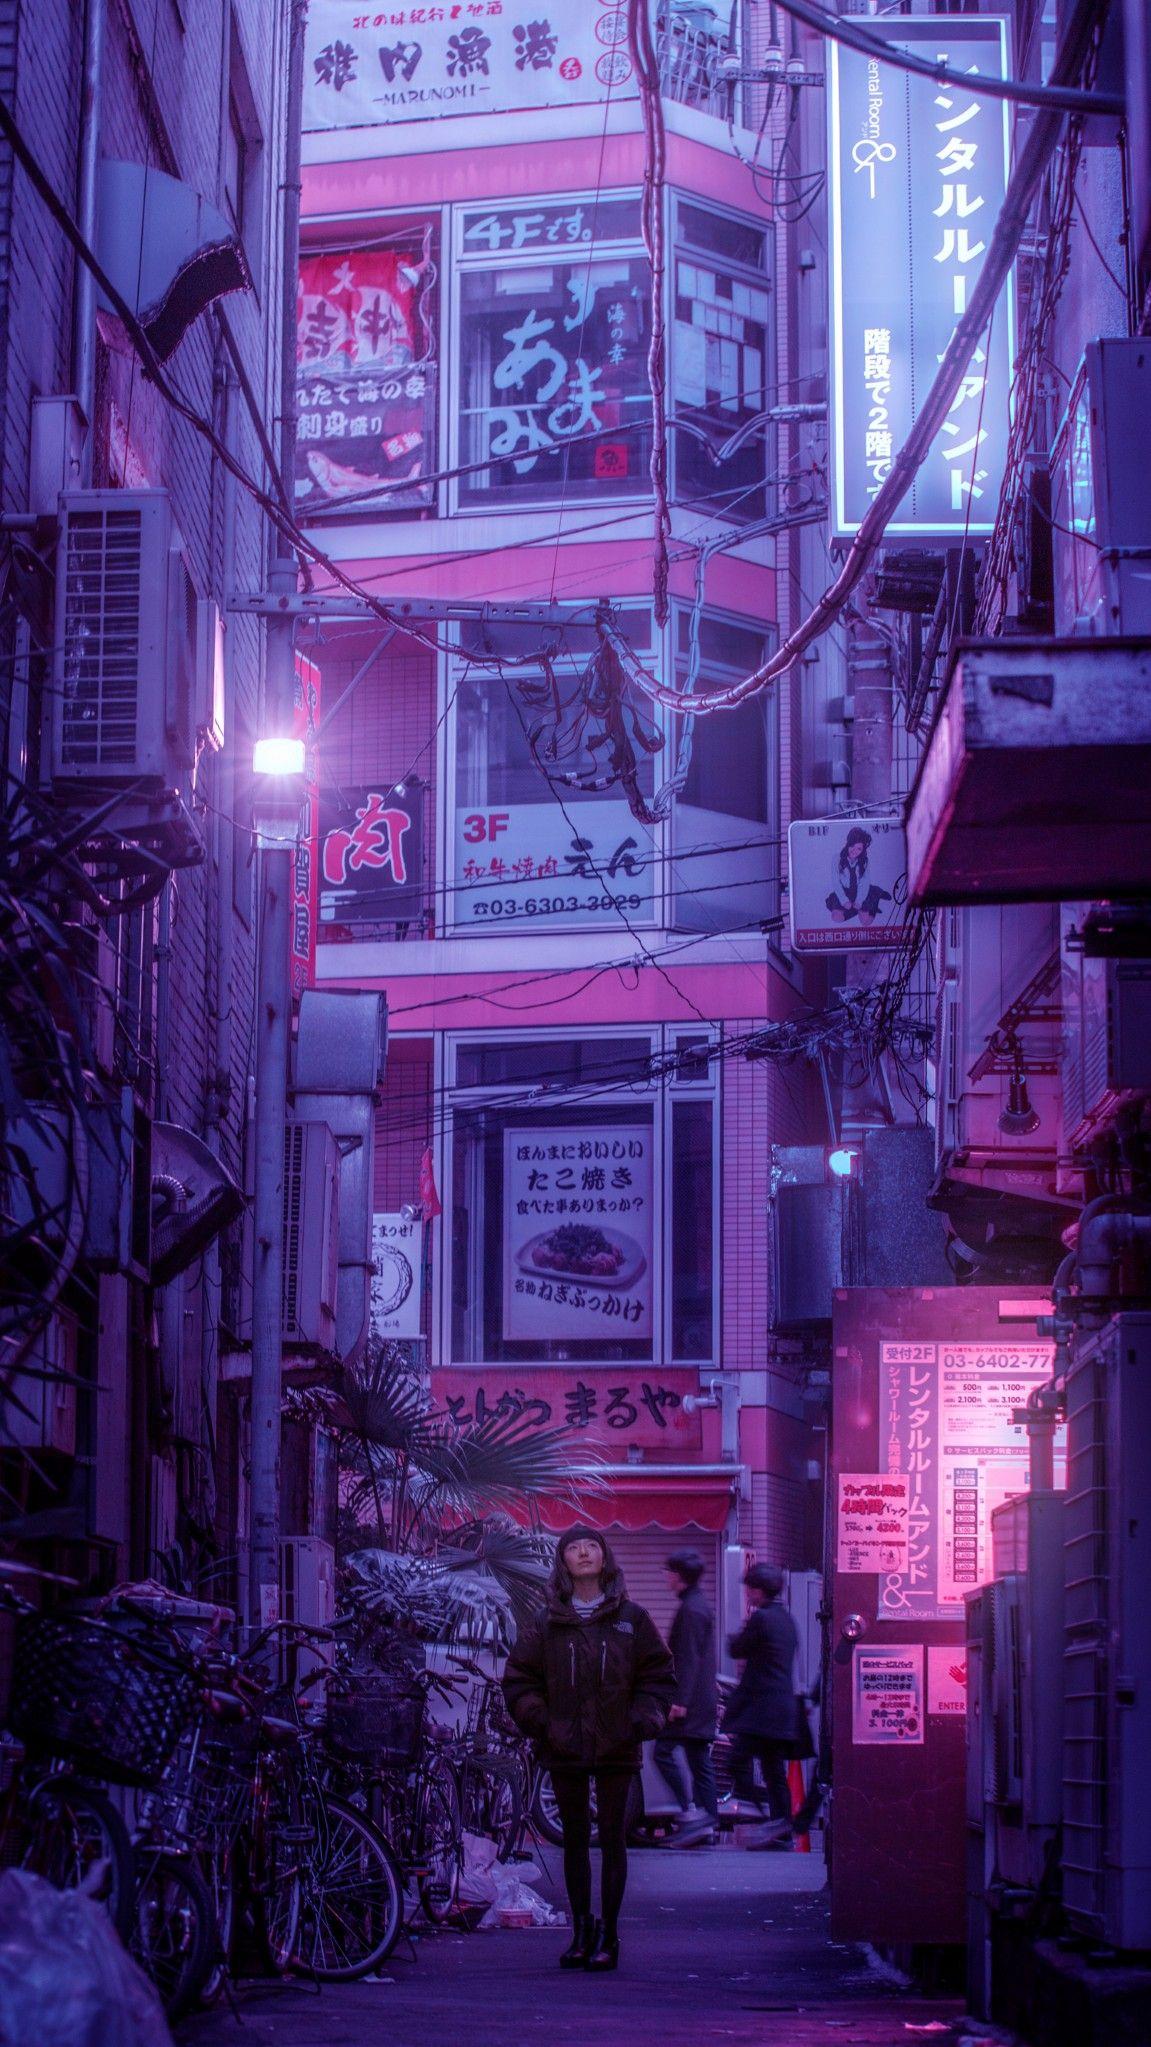 Chill Vibes Lofi Neon Lights Japanese Cyberpunk